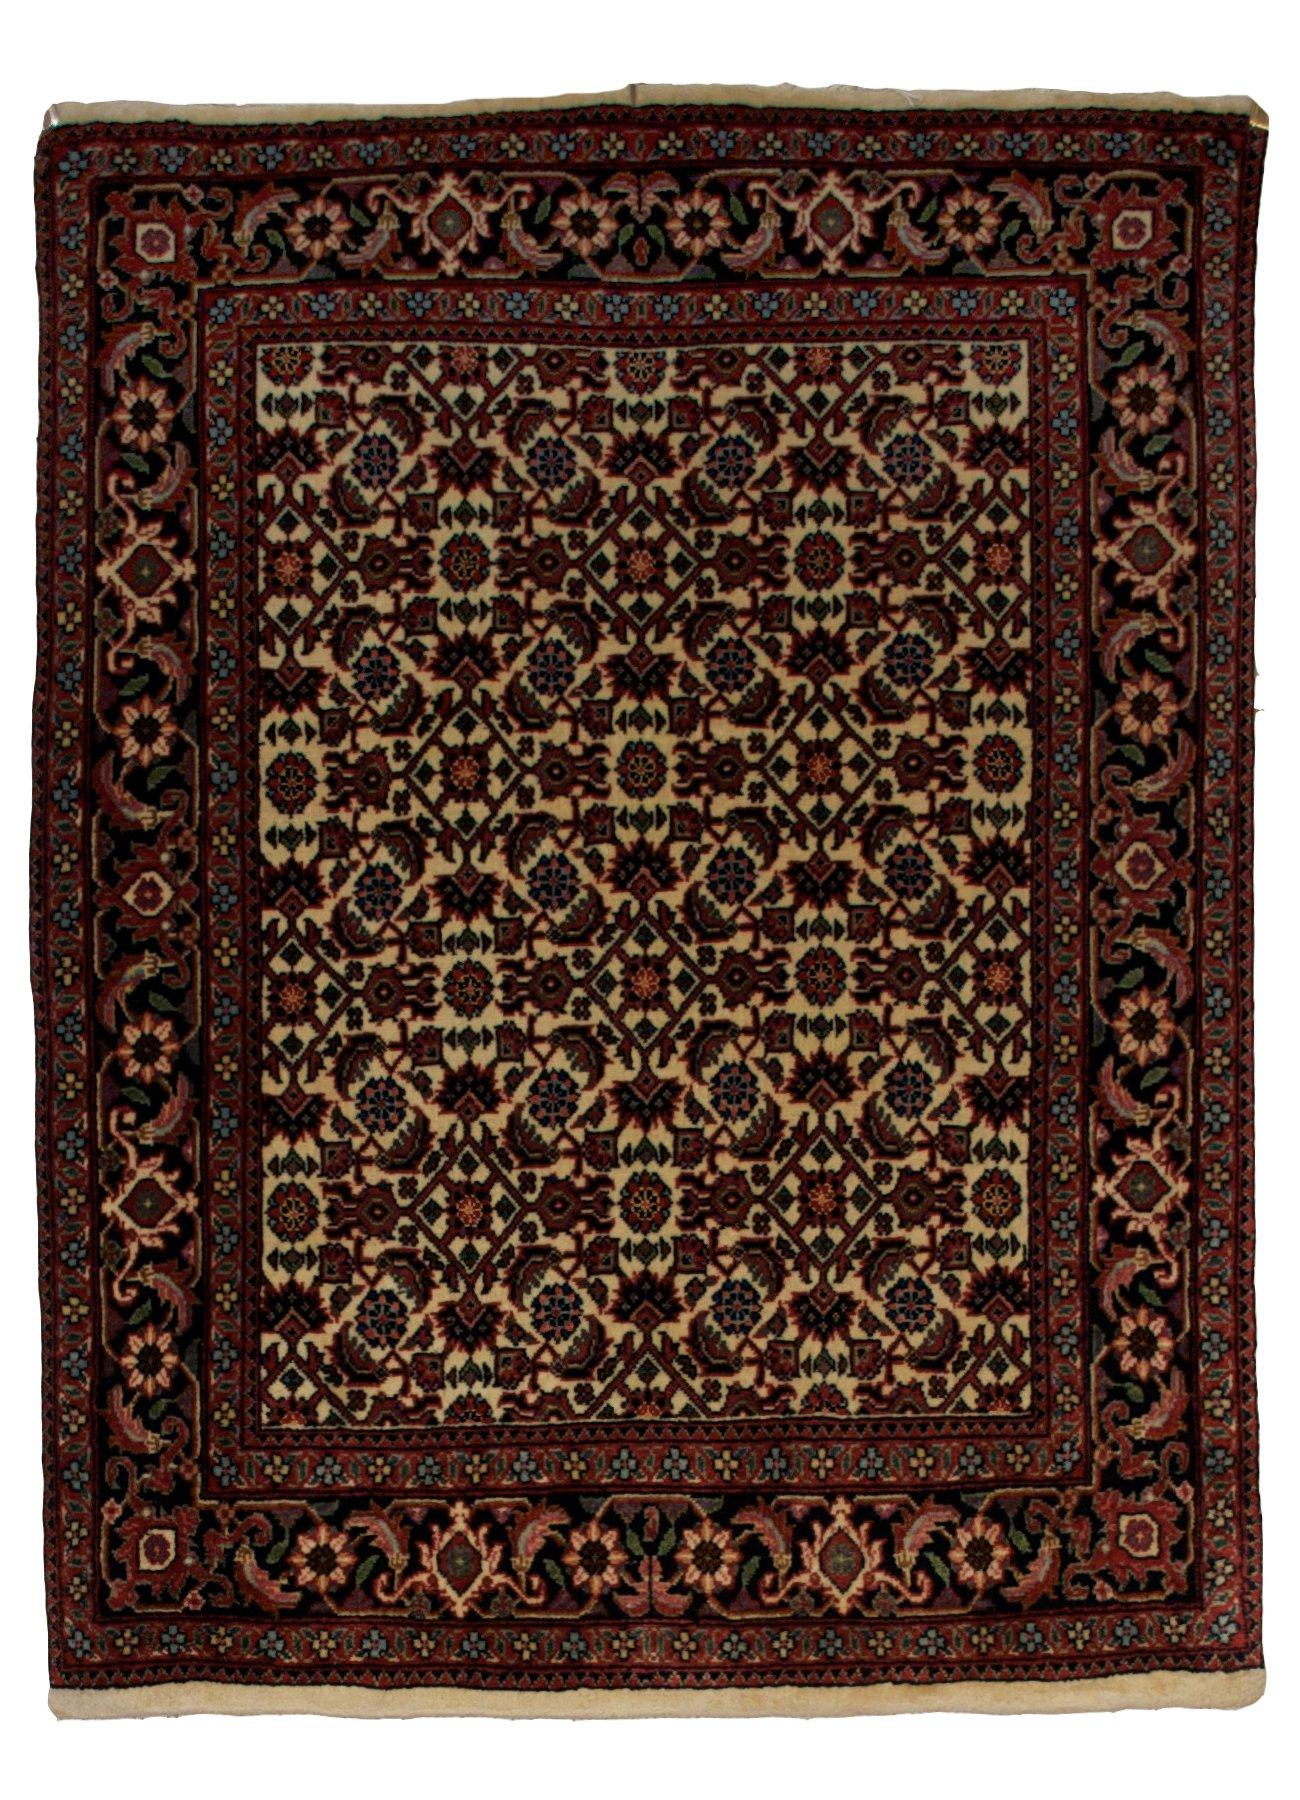 "Persian Bijar 2' 6"" x 3' 4"" Handmade Area Rug - Shabahang Royal Carpet"